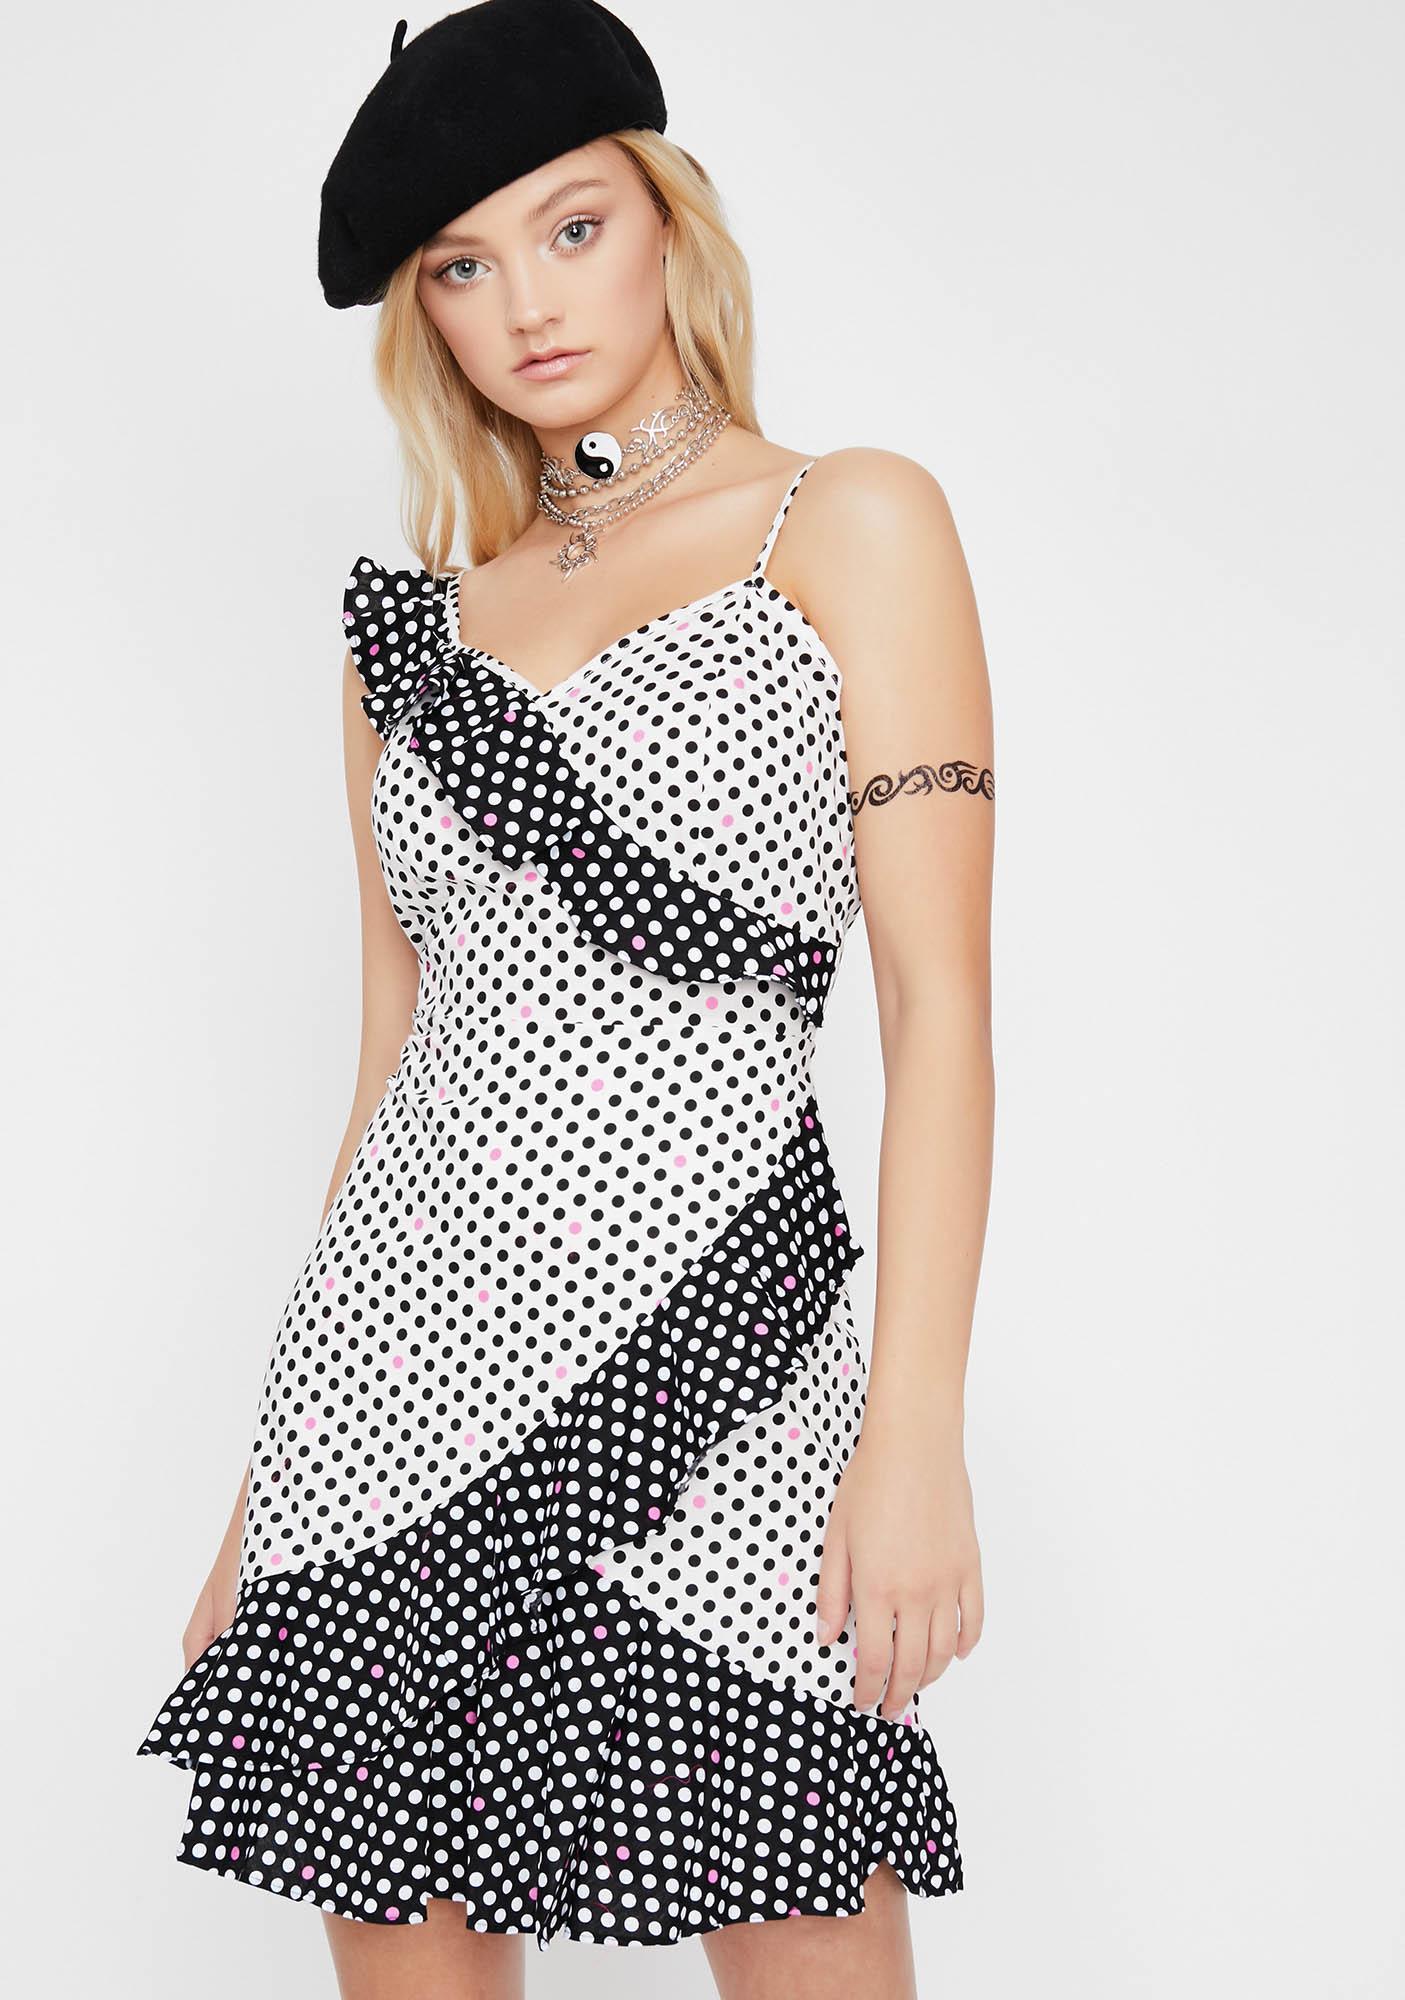 5661e3930f1 Bombshell Bae Mini Dress